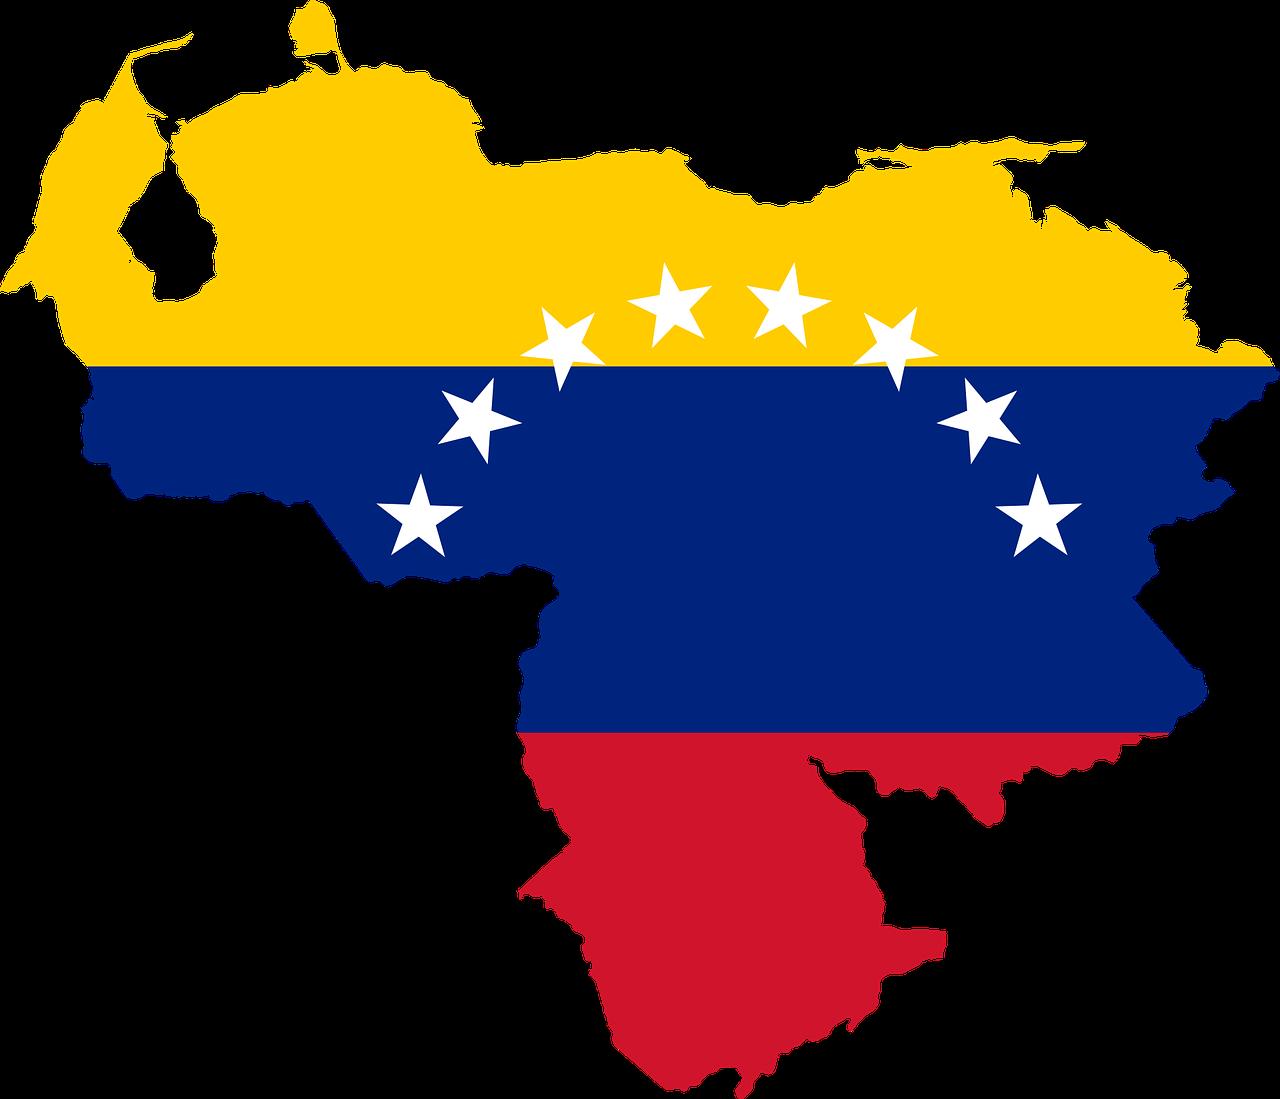 heller civil war in venezuela is inevitable the whit online